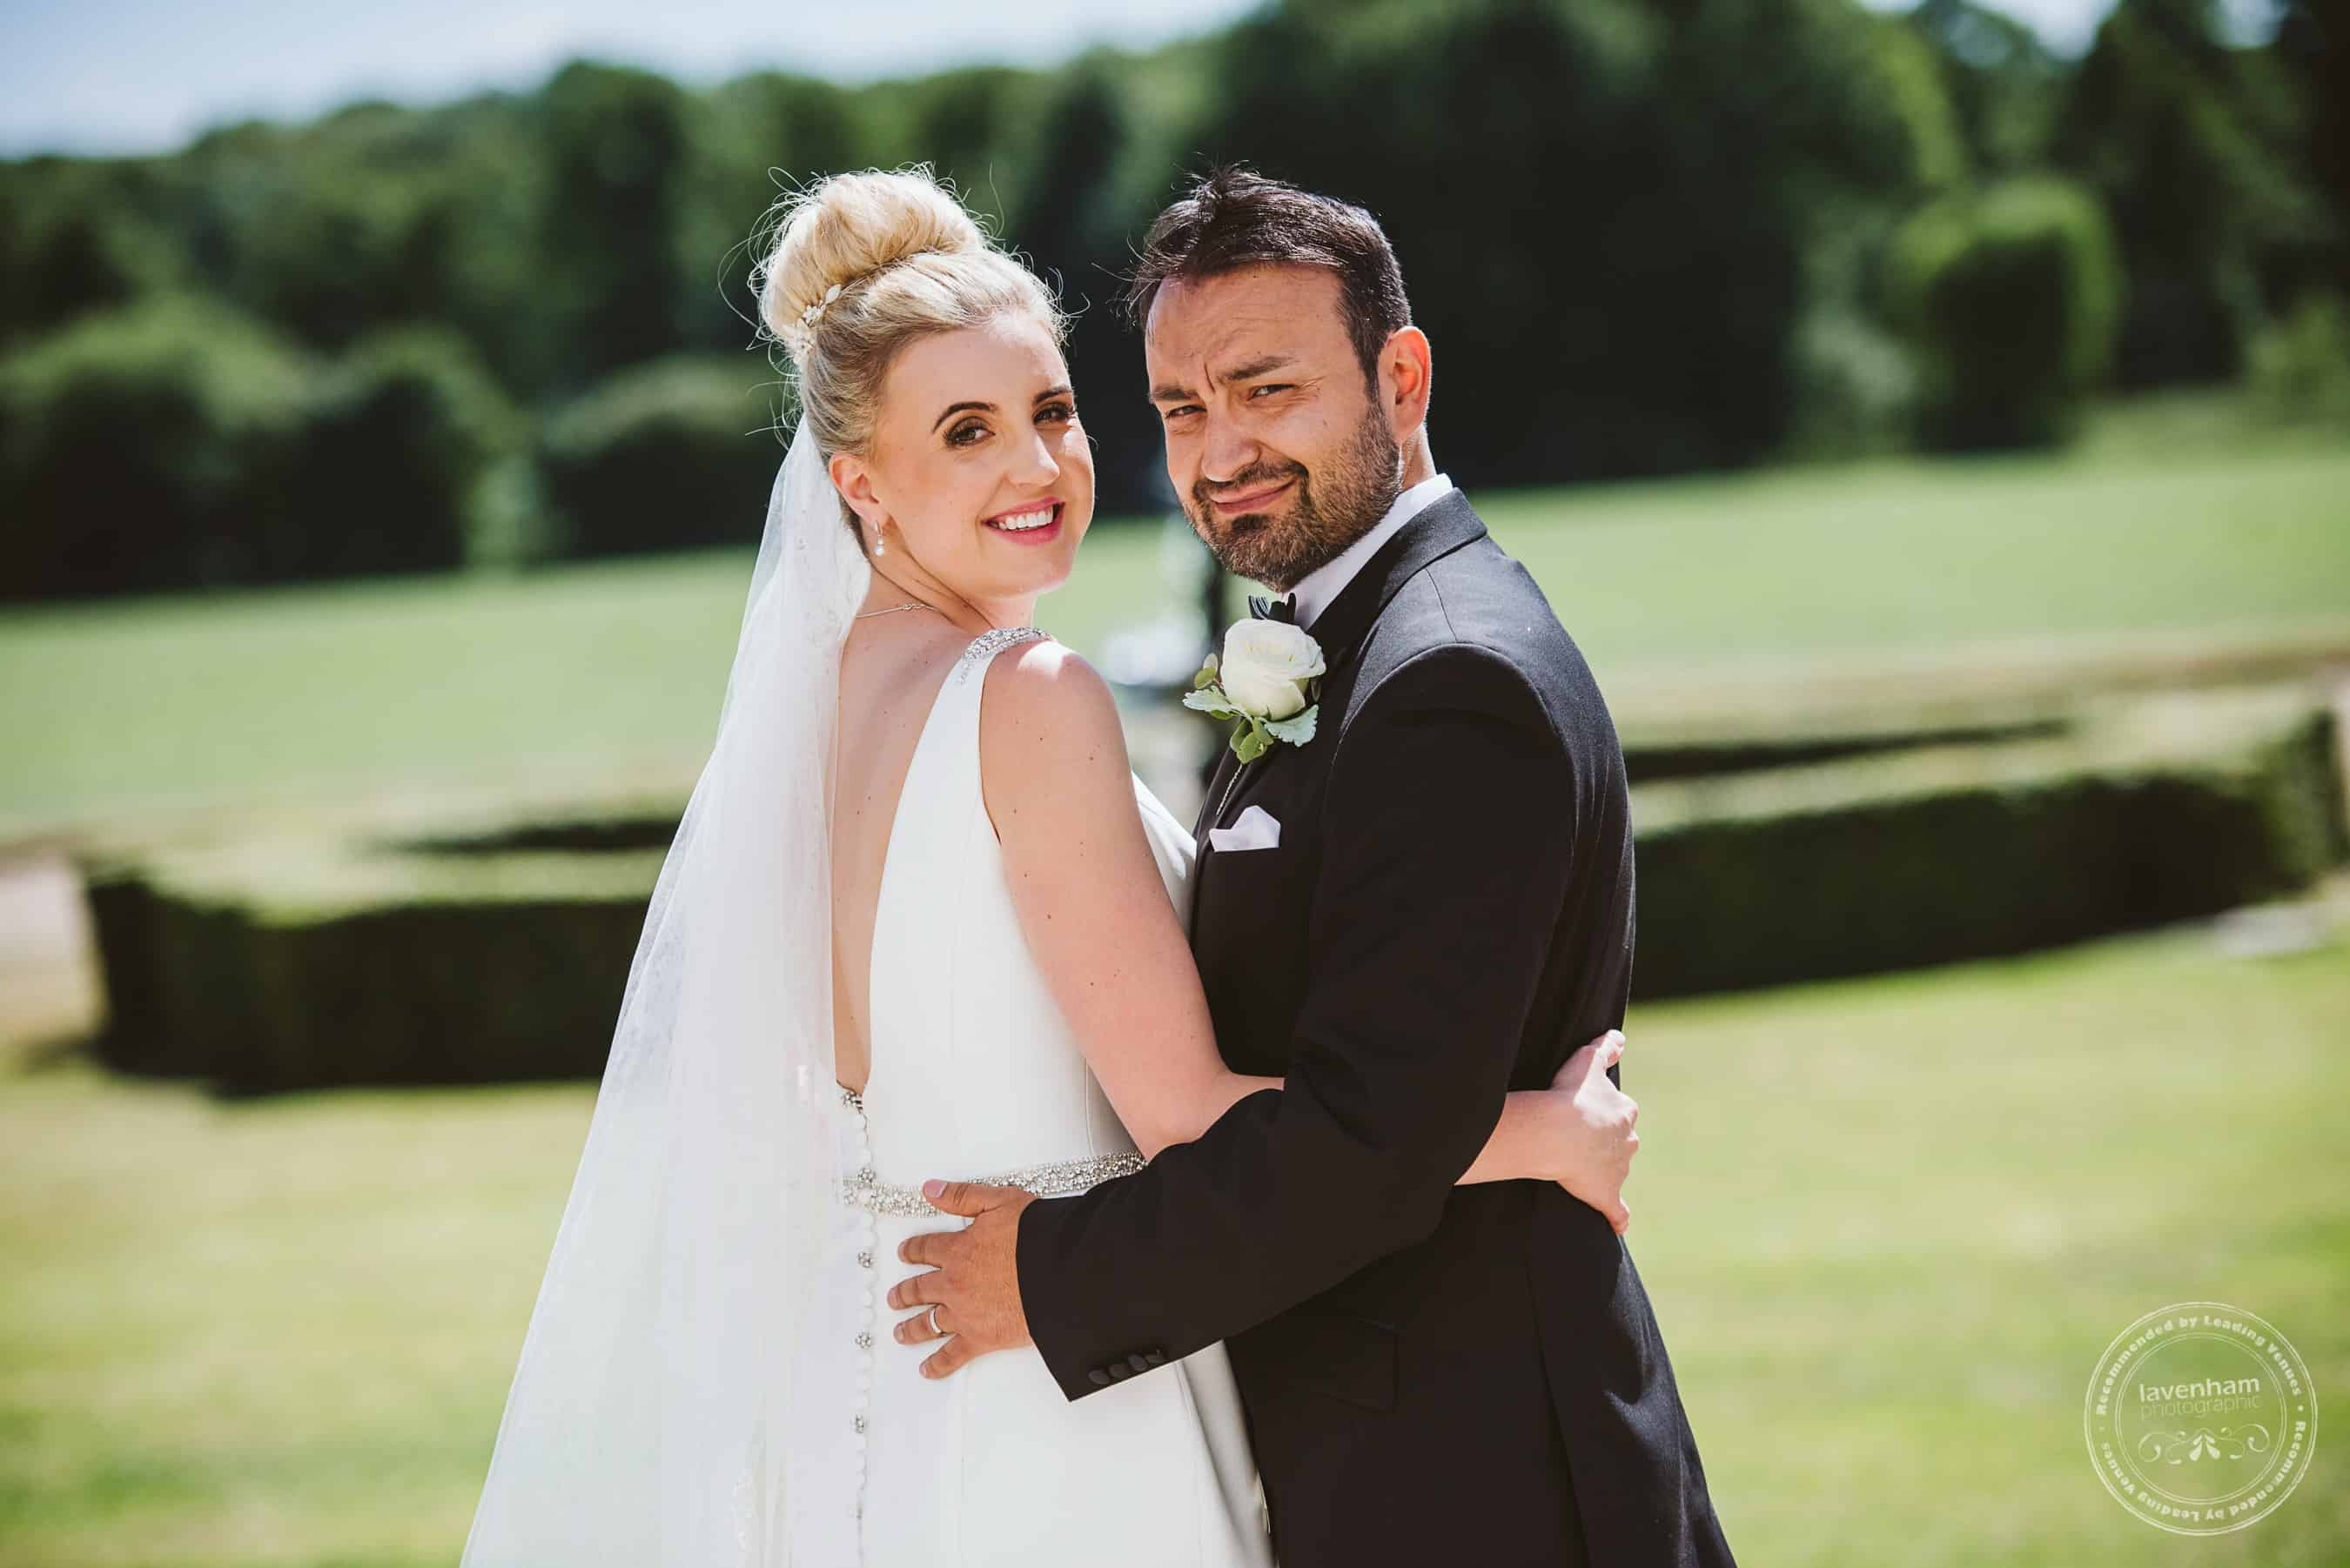 220618 Gosfield Hall Wedding Photography Lavenham Photographic 0119